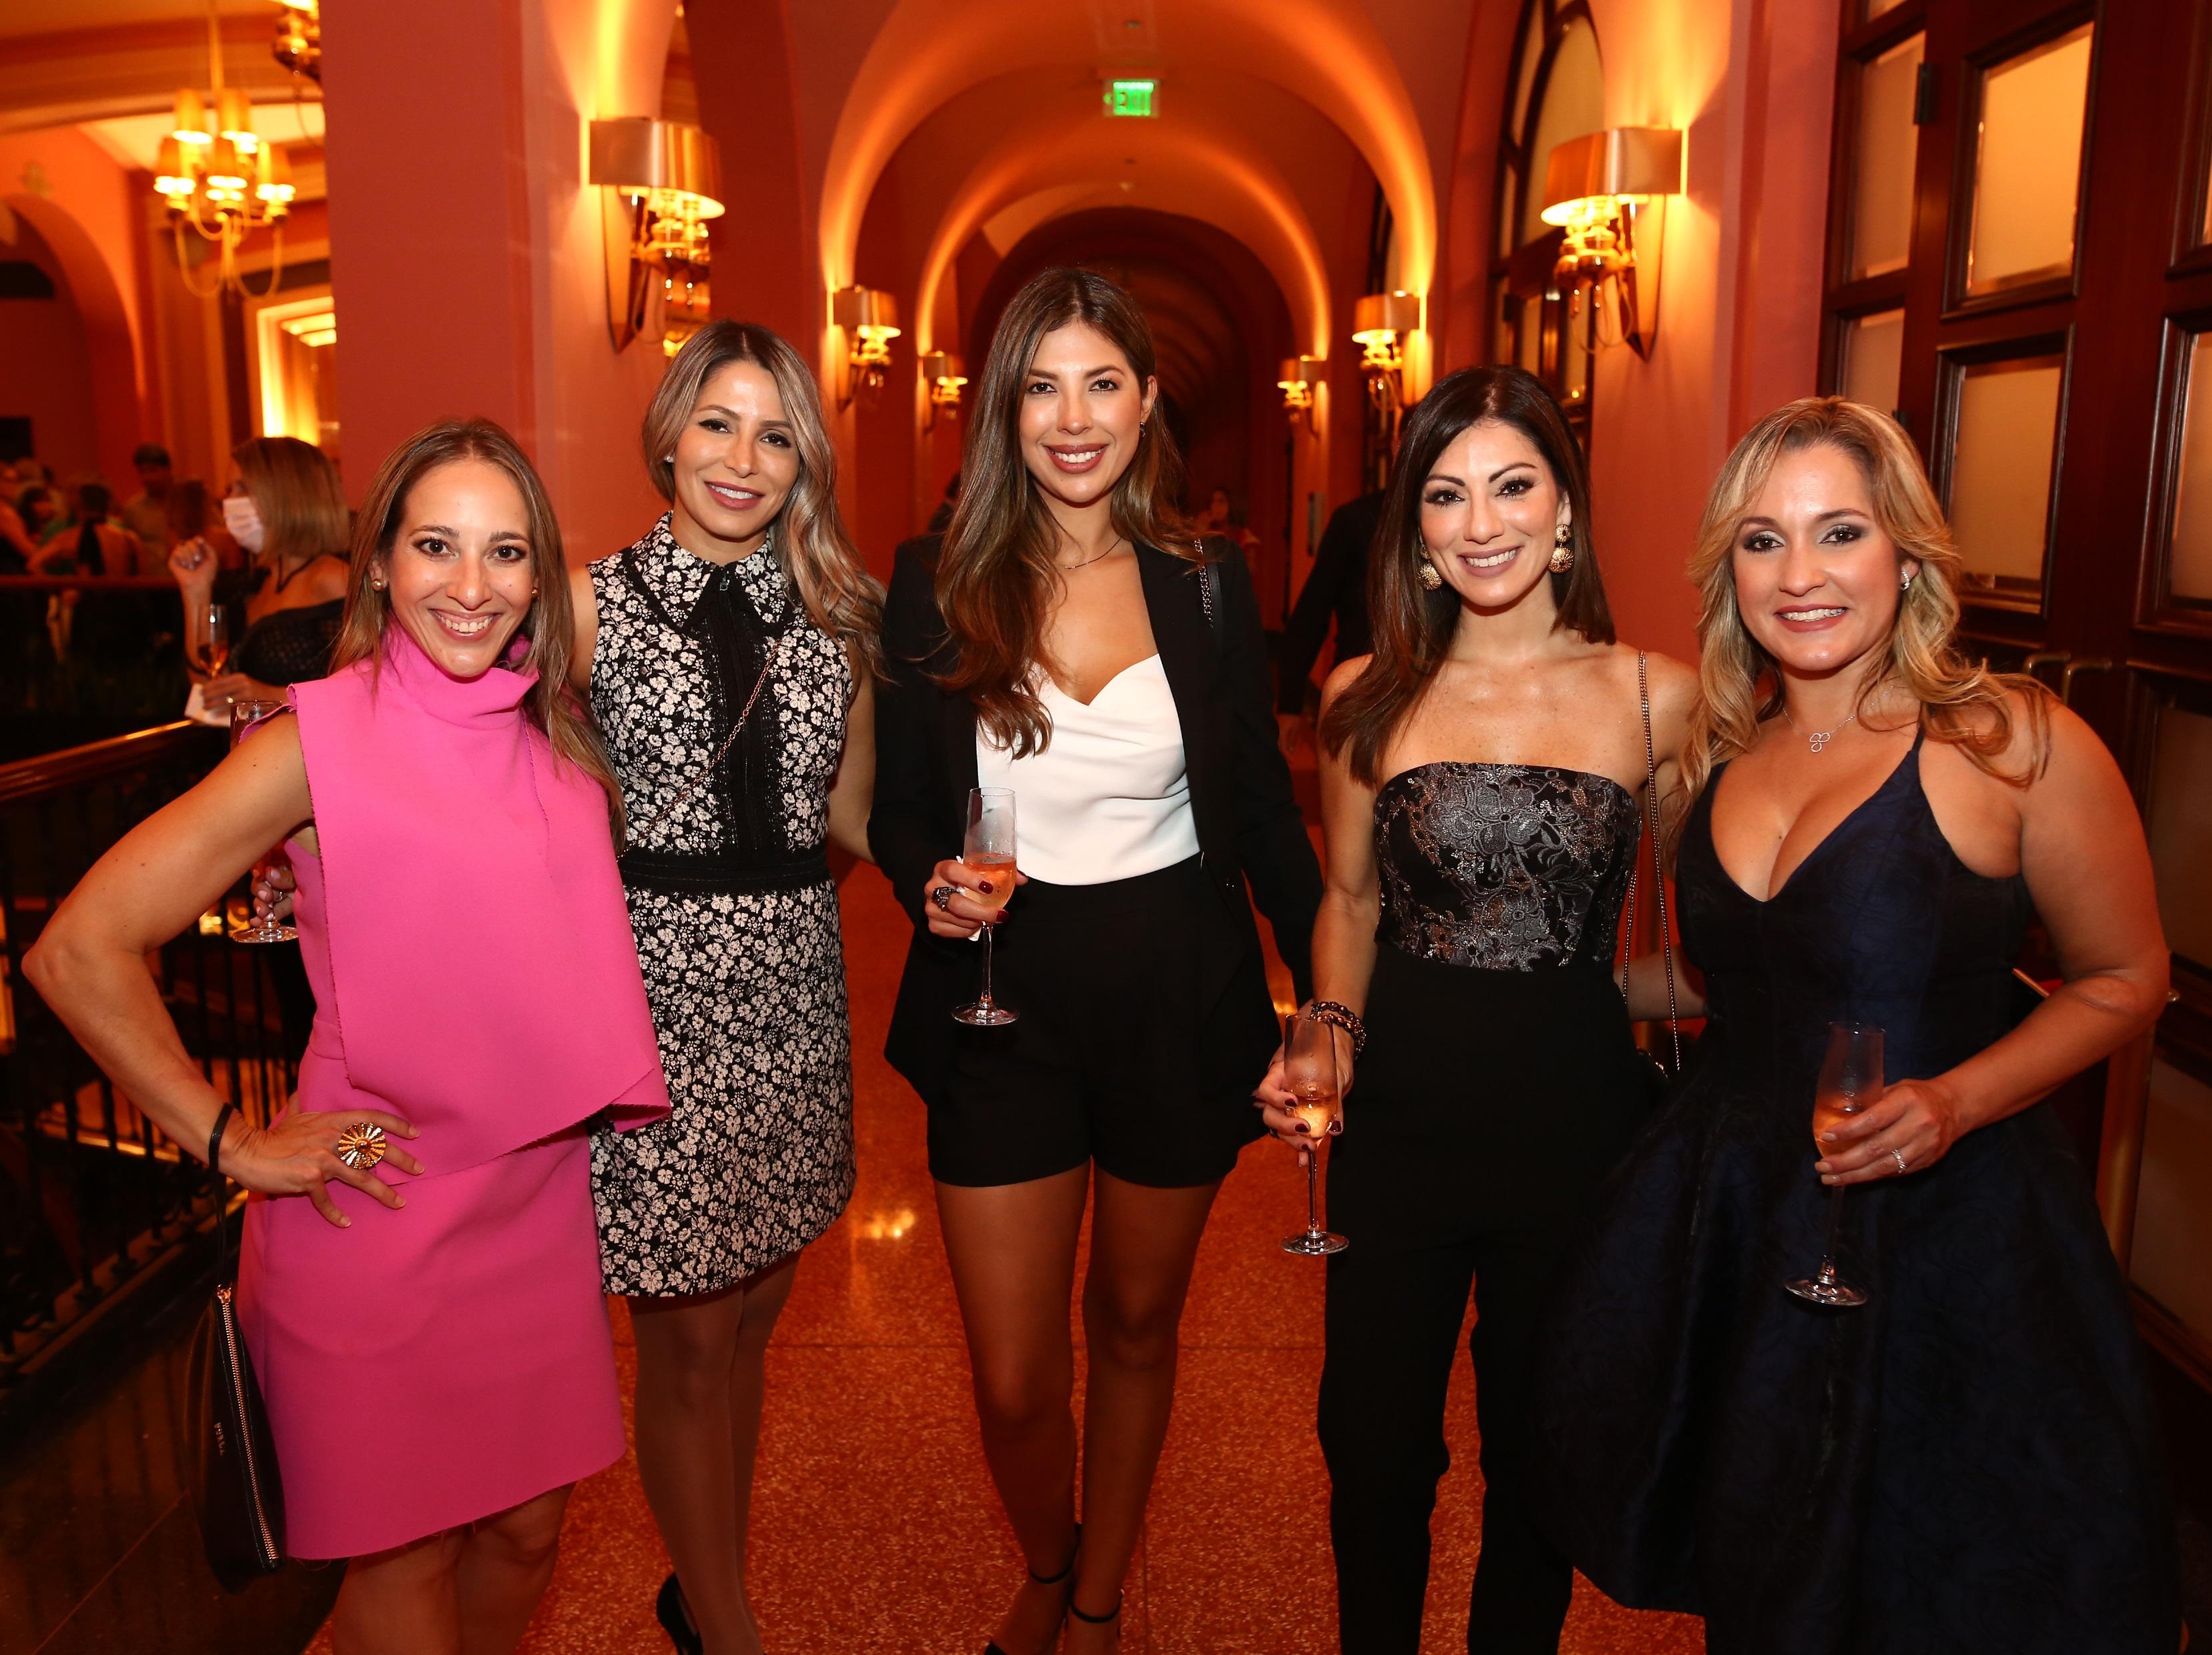 Liana Camacho, Yaritza Collazo, Alejandra Gaona, Nicole Rodríguez y Belly Torres (Foto: José Rafael Pérez Centeno)